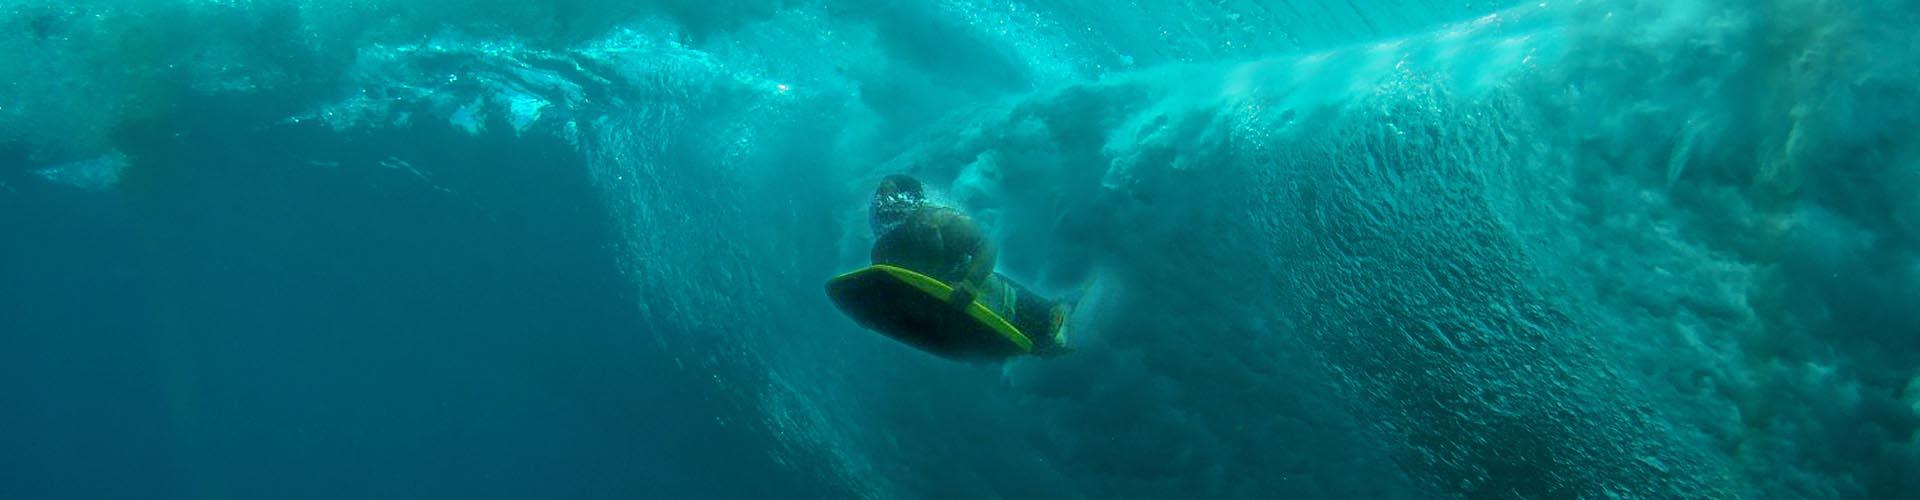 Bully Boarder Duck Dive